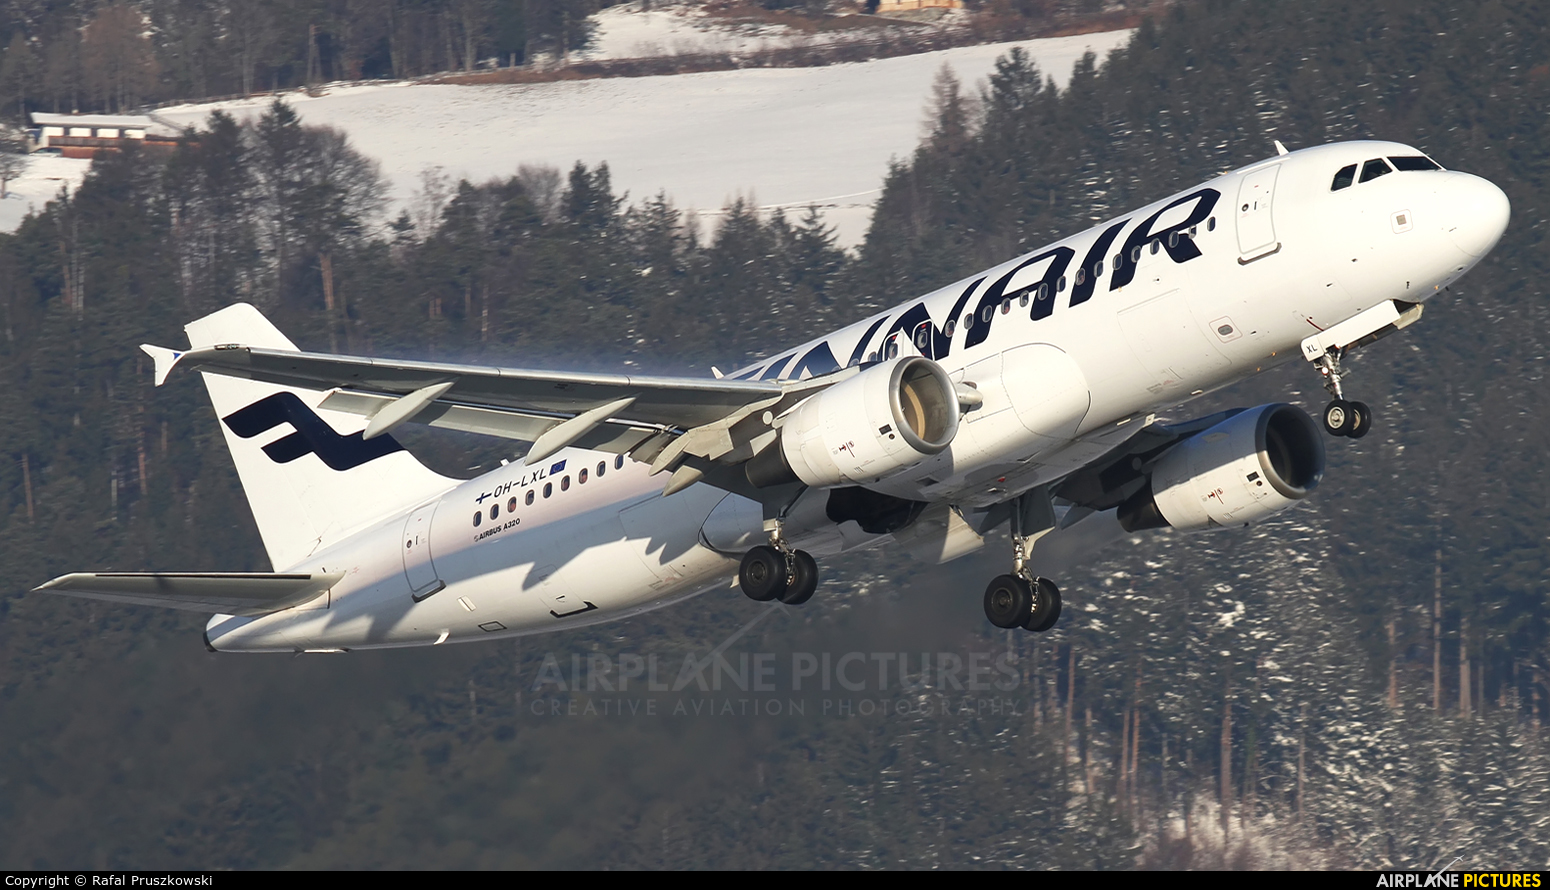 Finnair OH-LXL aircraft at Innsbruck